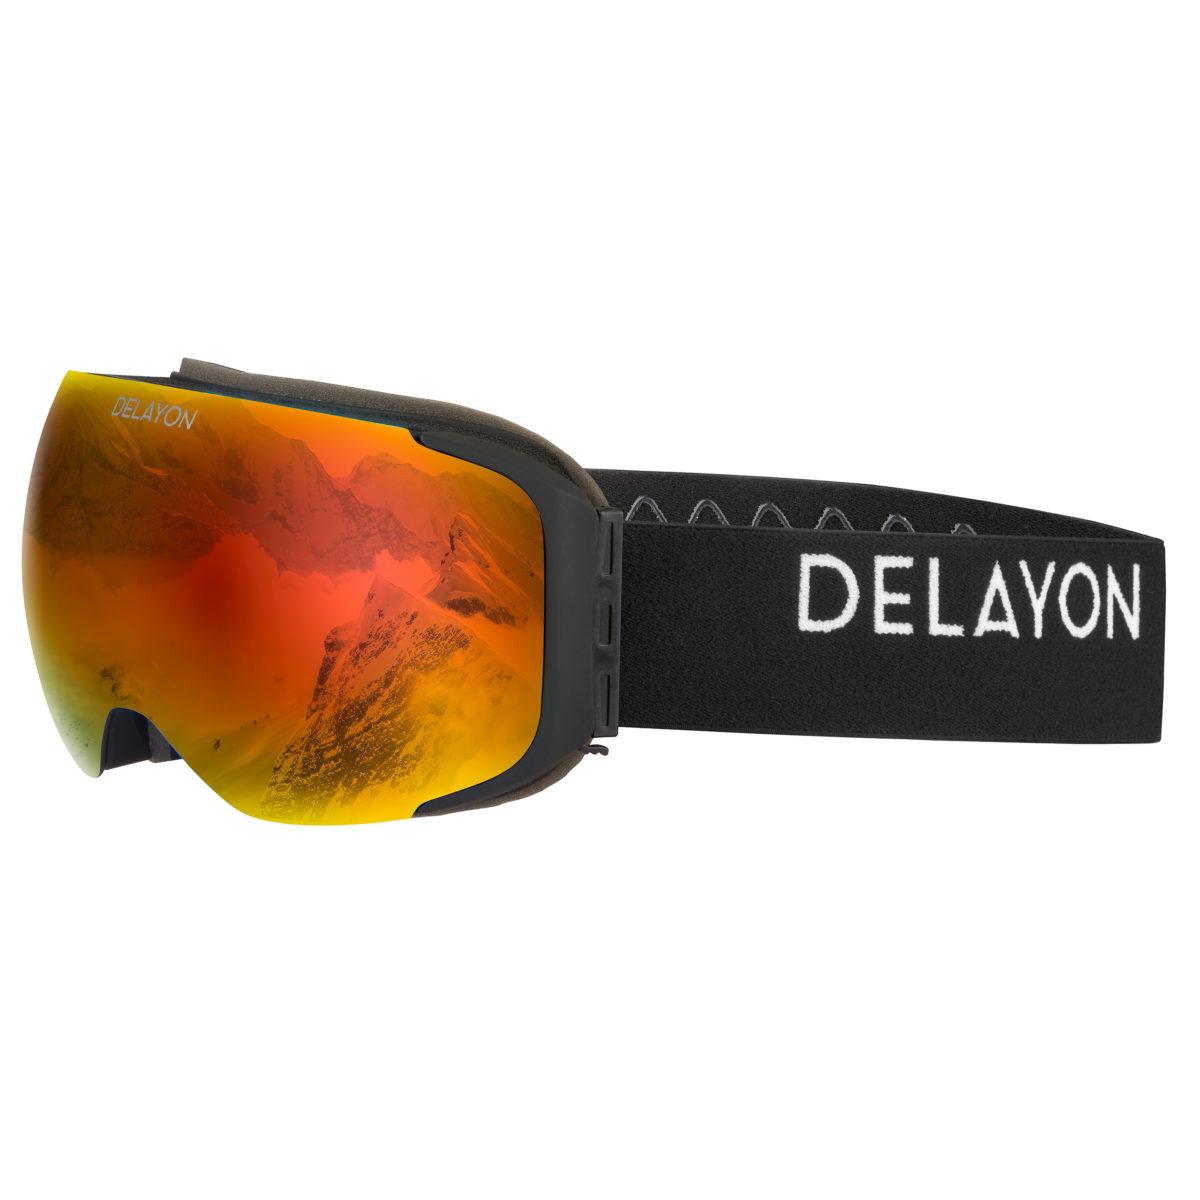 DELAYON_Eyewear_Explorer_Black_Fire_Front.jpg